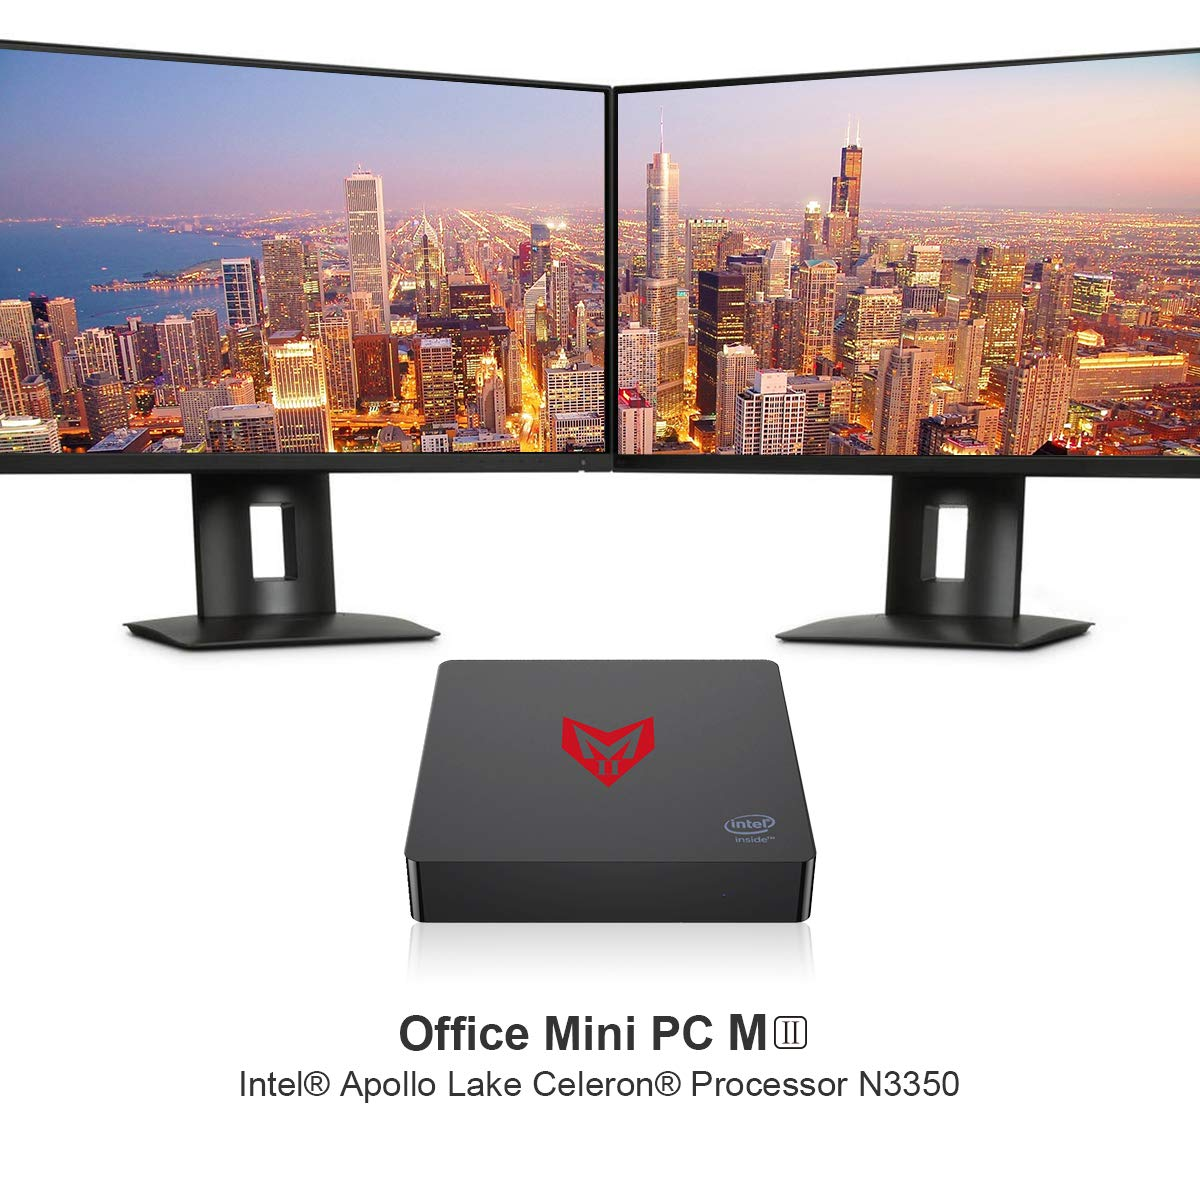 SeeKool MII Mini PC Ordenador de sobremesa, Full 4K HD H.265 Soporte Windows 10 Mini ordenador, 4GB+64GB, Apollo Lake N3350 Procesador, Dual-Band WiFi, ...